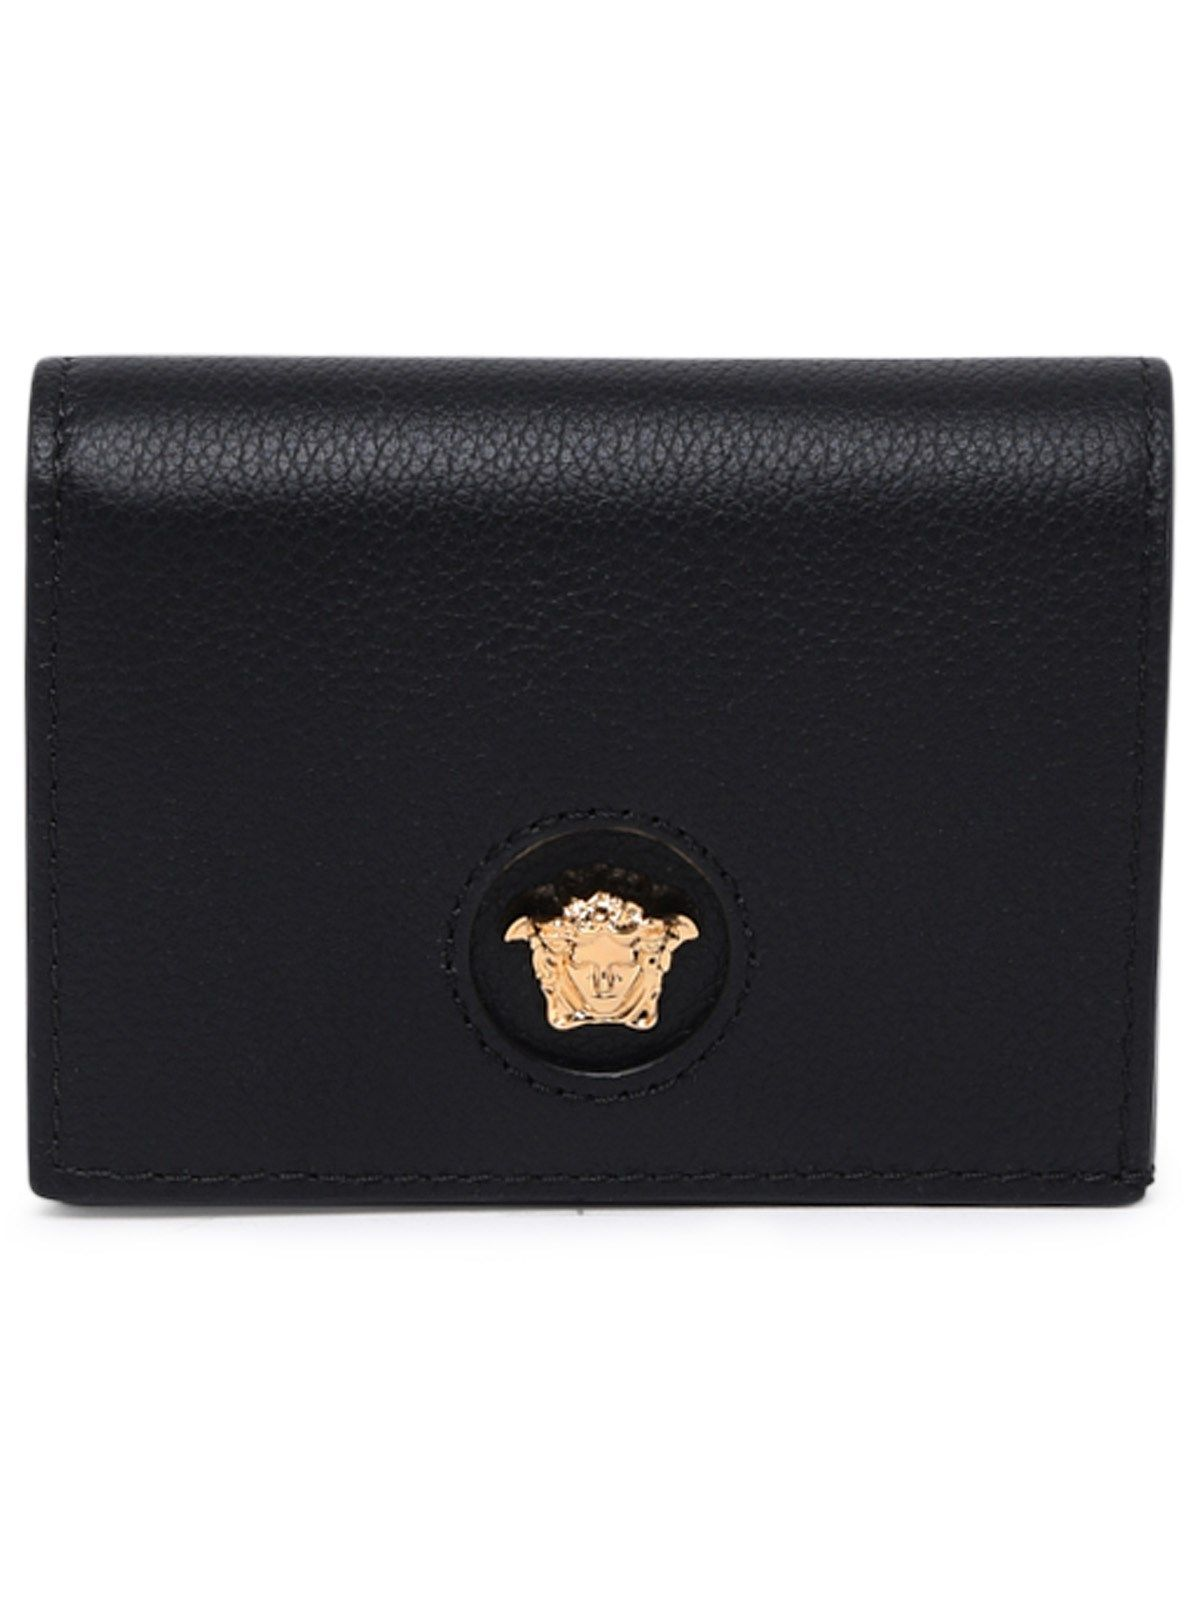 Versace Women's Black Leather Wallet